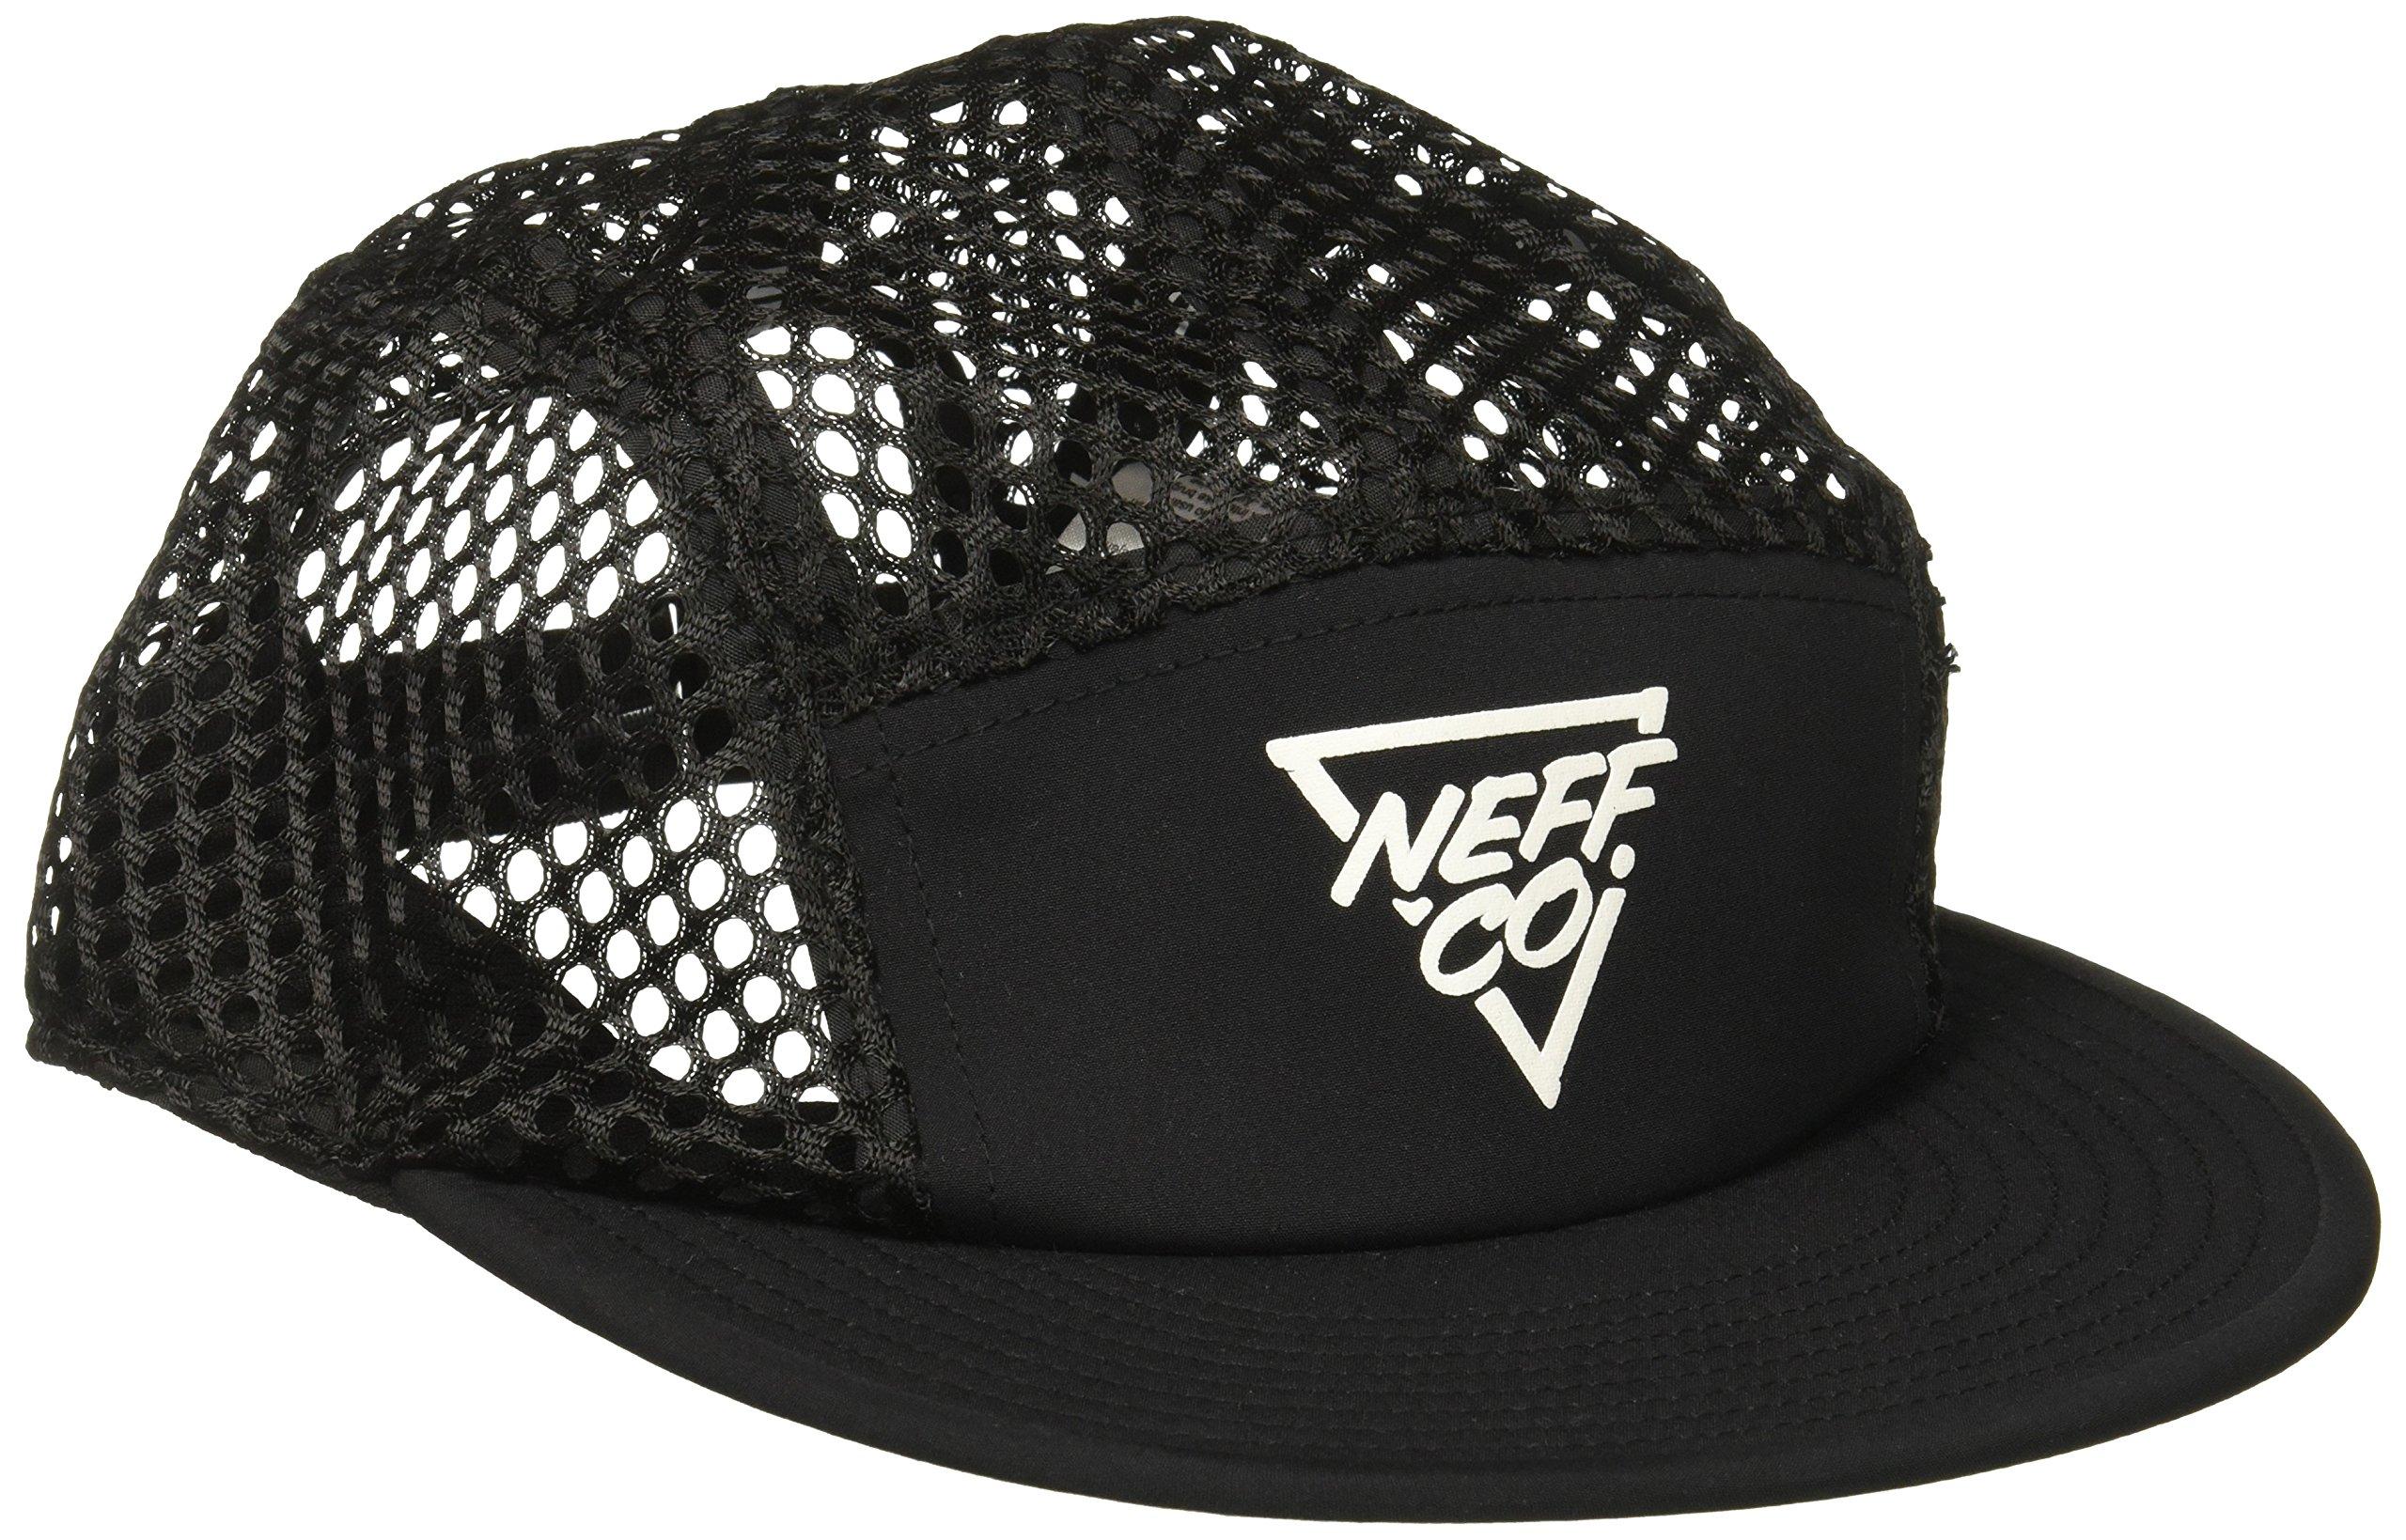 NEFF Men's Fanna Camper, Black, One Size by NEFF (Image #1)